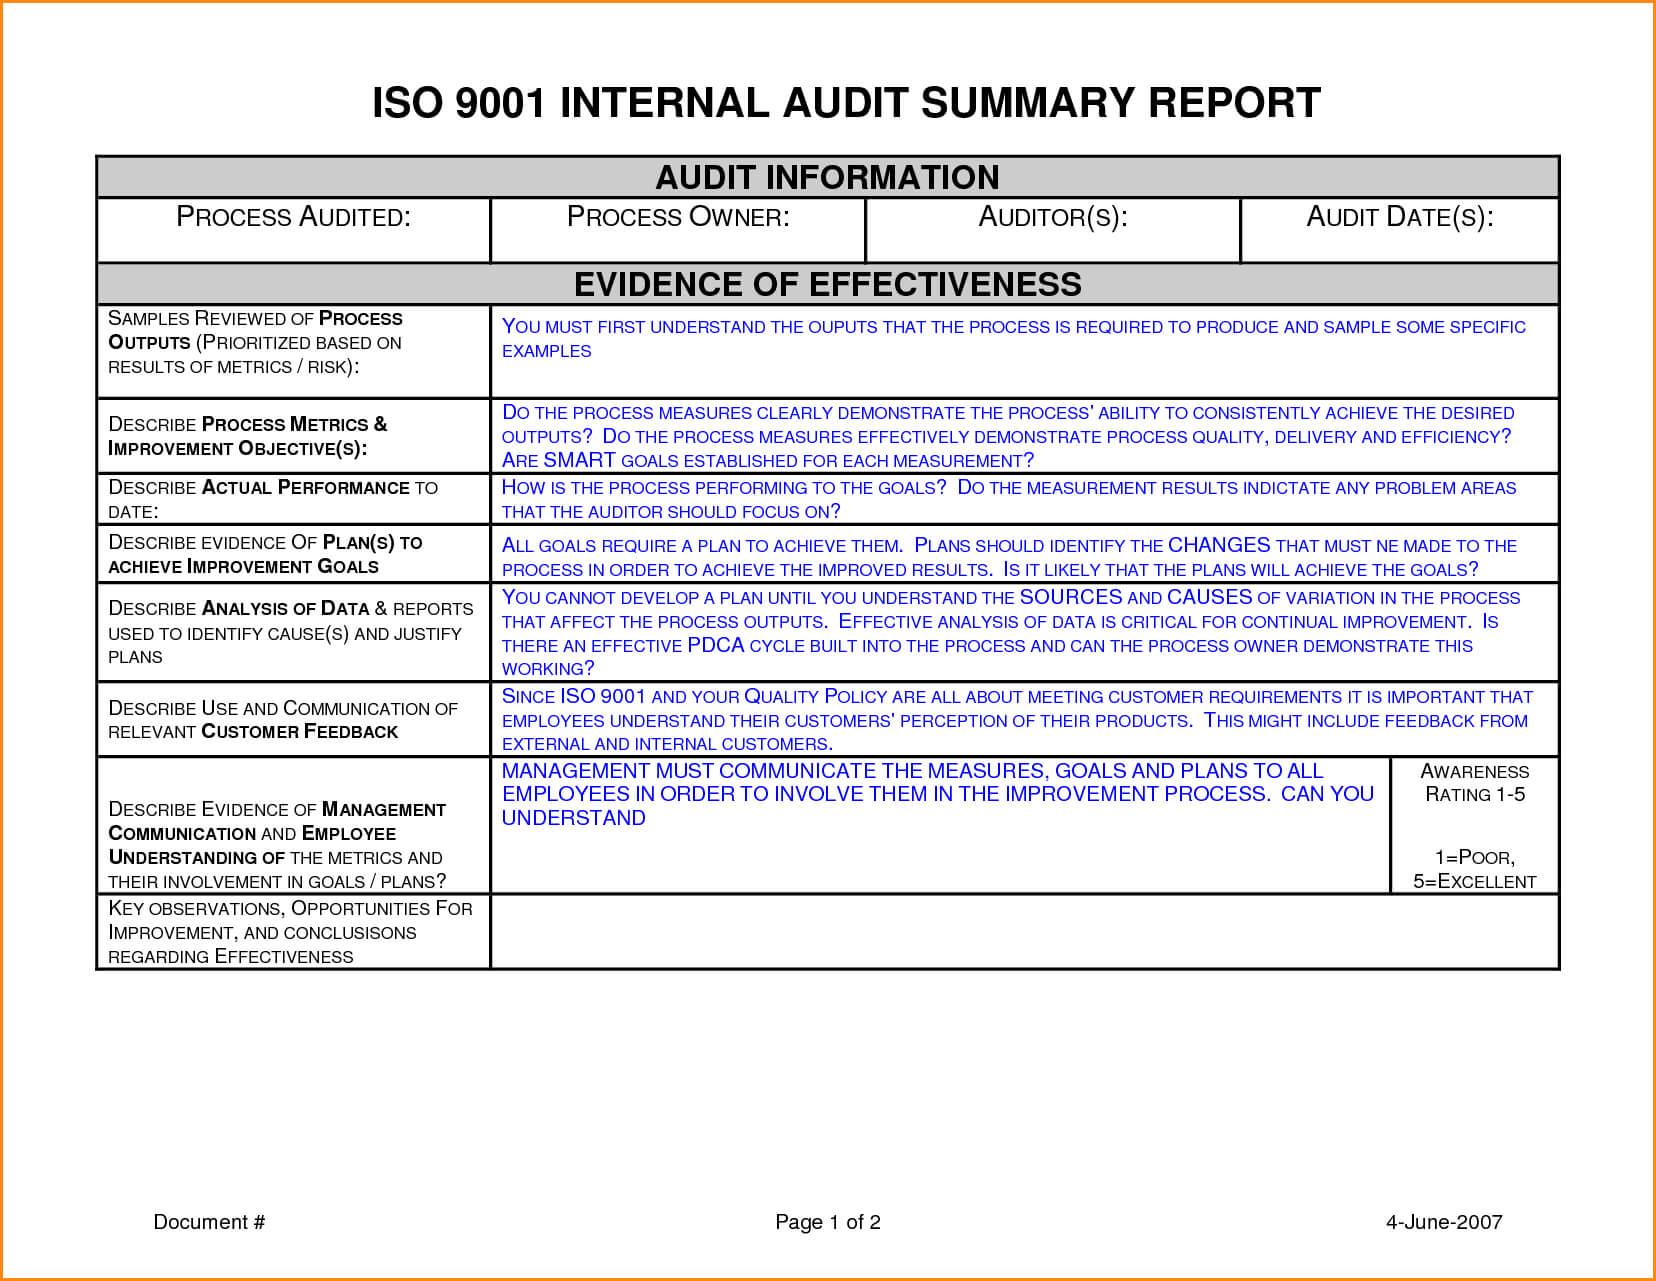 012 Template Ideas Internal Audit Report Sample Unbelievable With Regard To Internal Audit Report Template Iso 9001